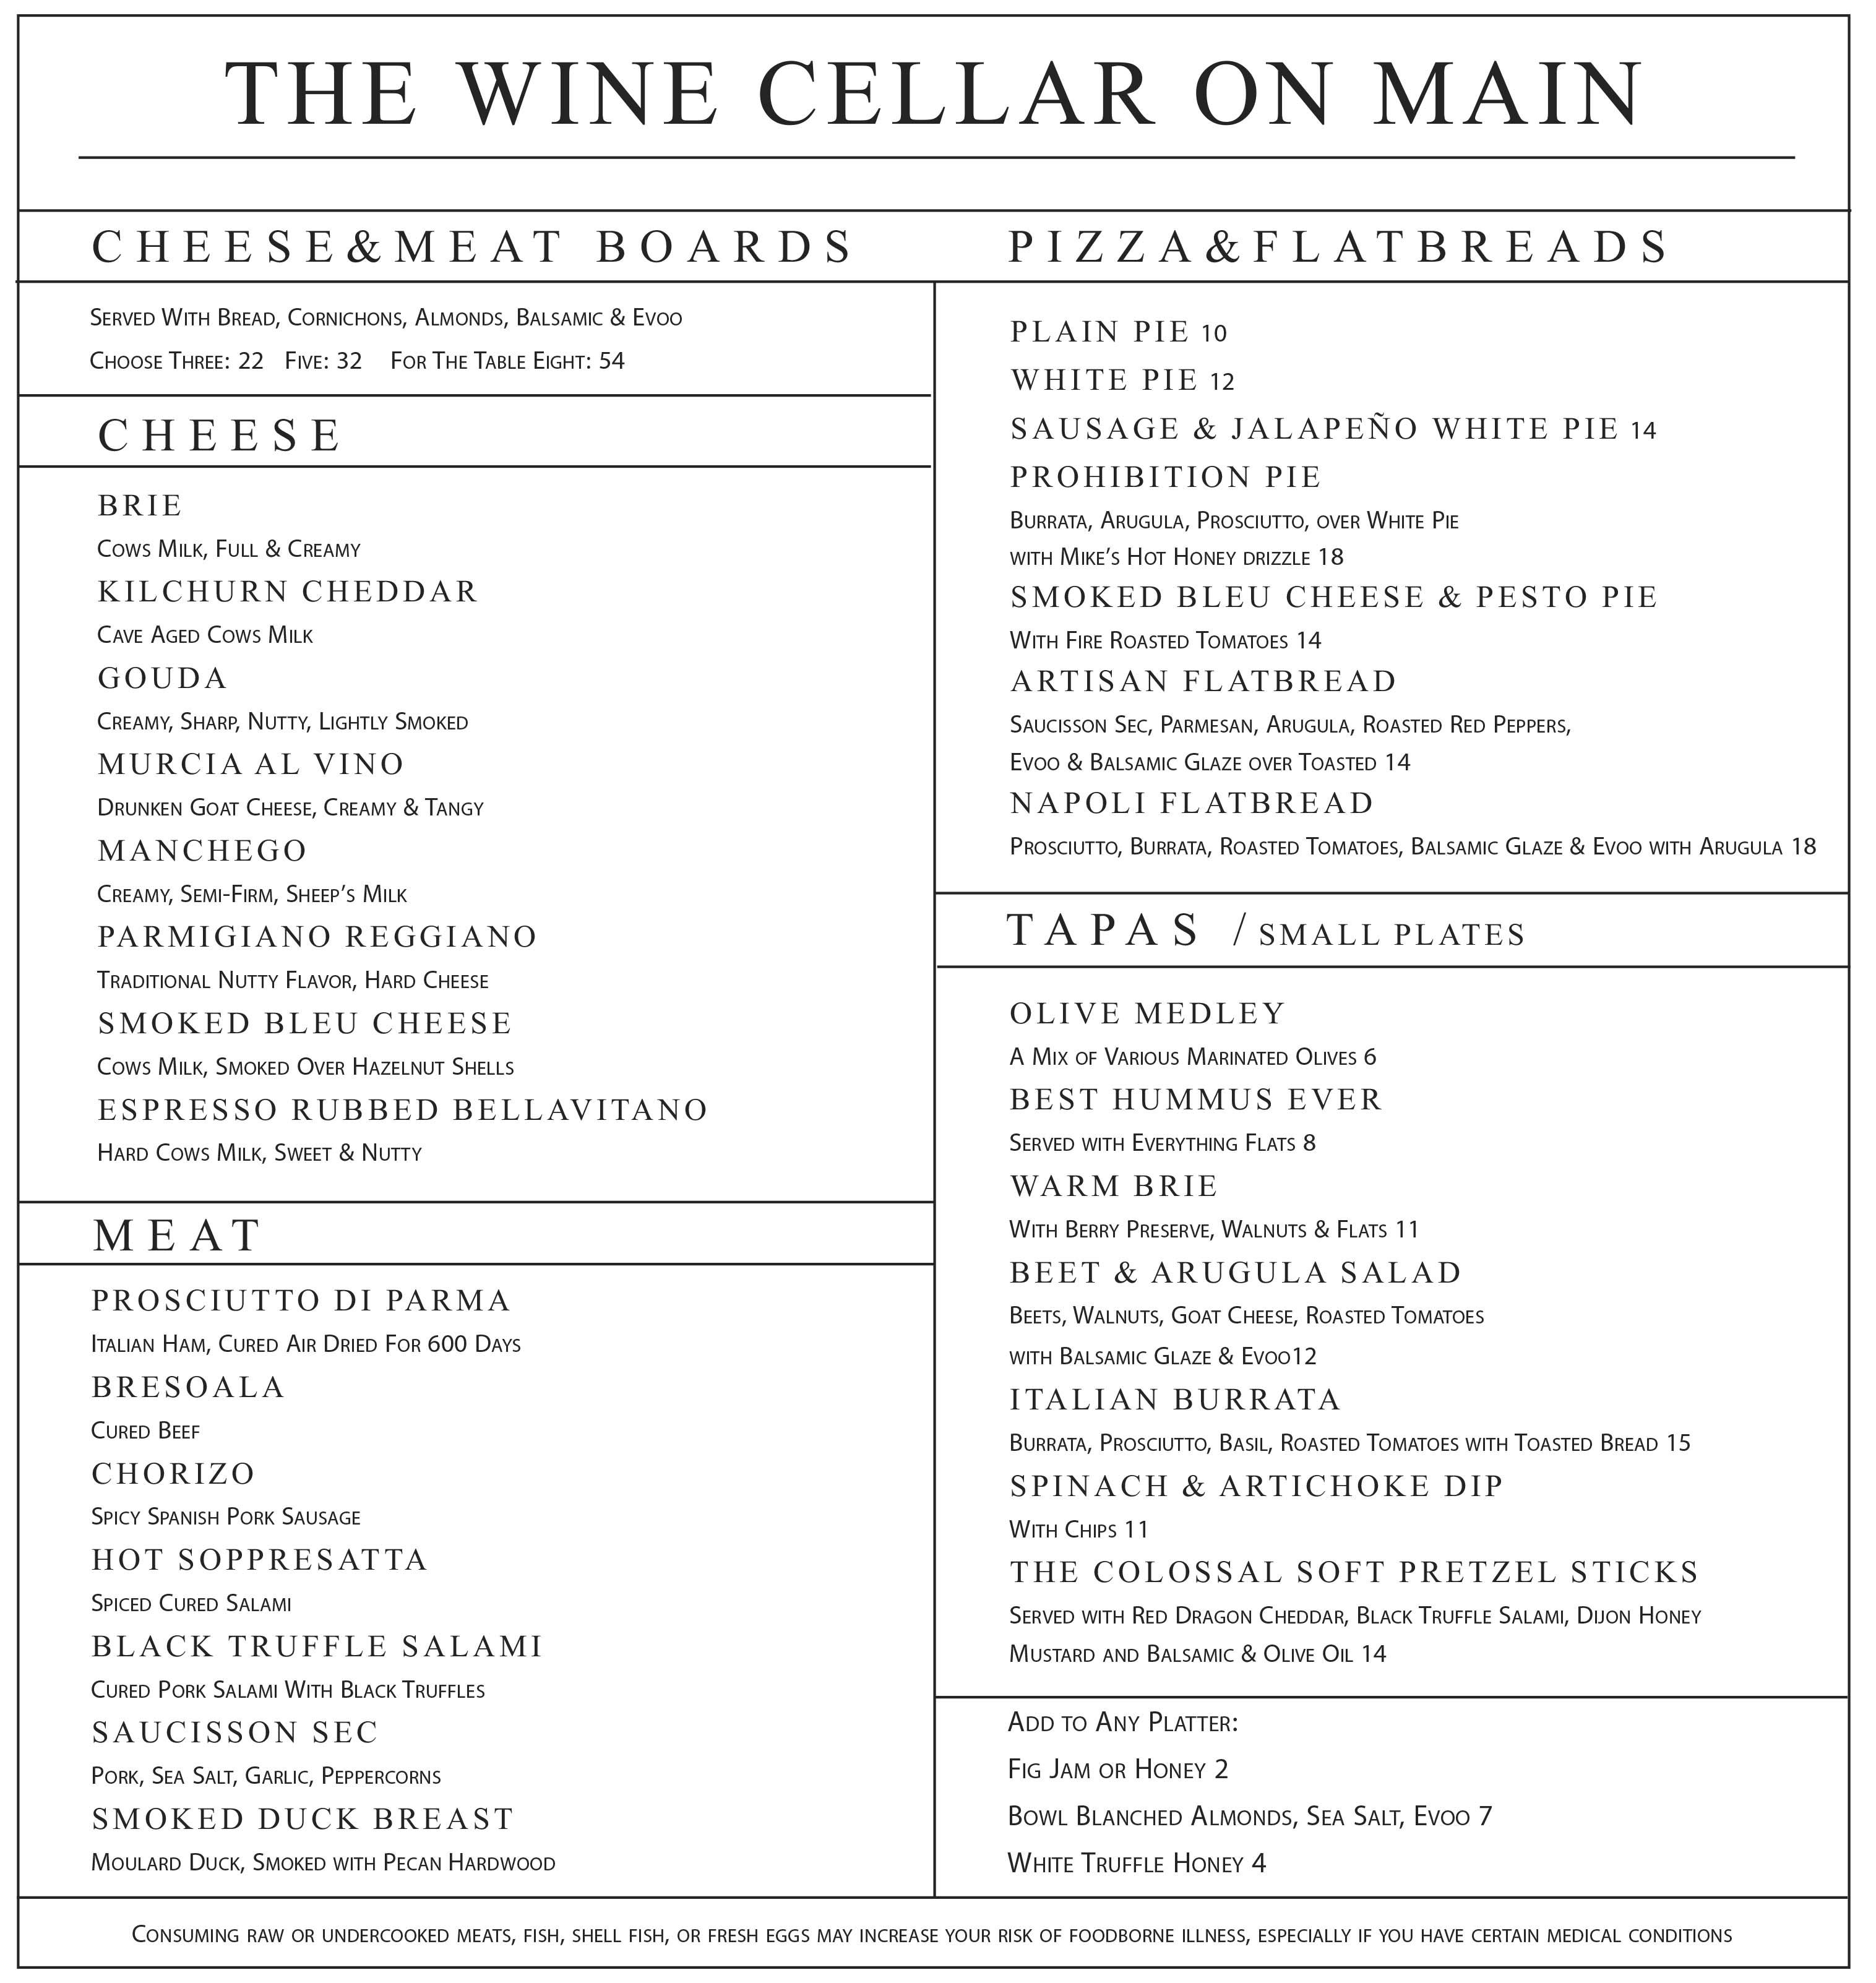 wine-cellar421-2.jpg